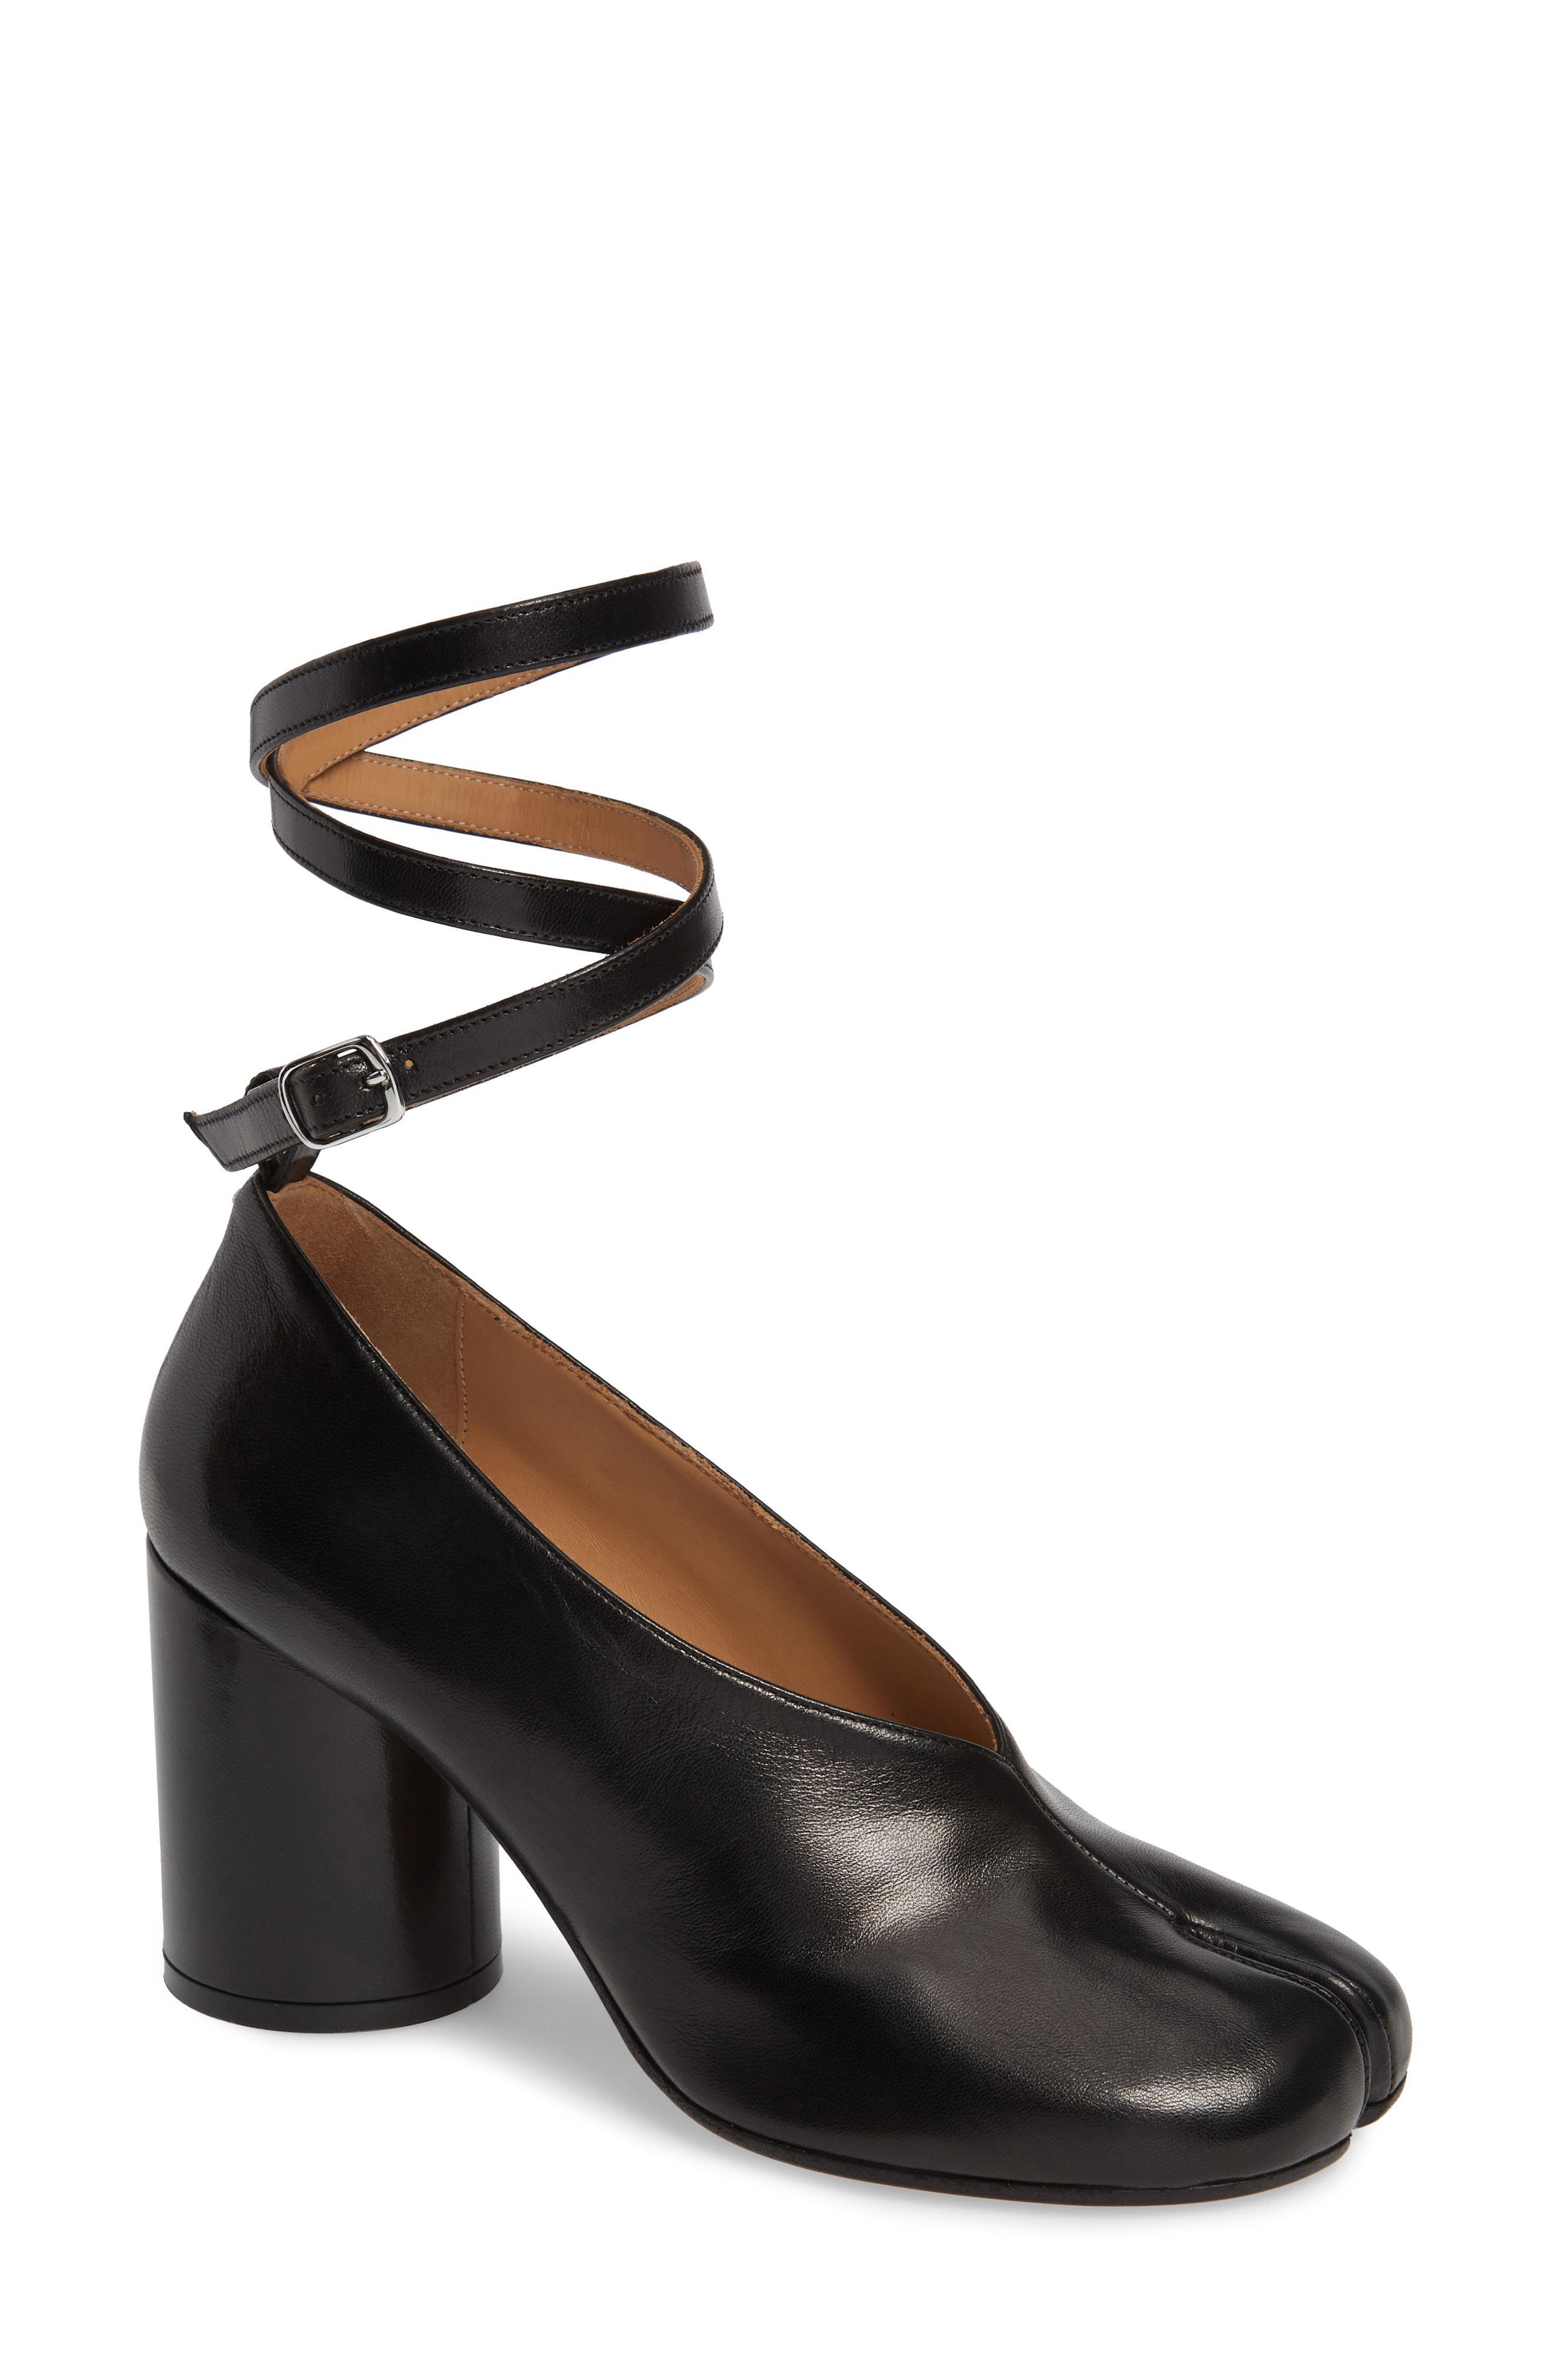 05956c36f7e2 Lyst - Maison Margiela Tabi Ankle Strap Pump in Black